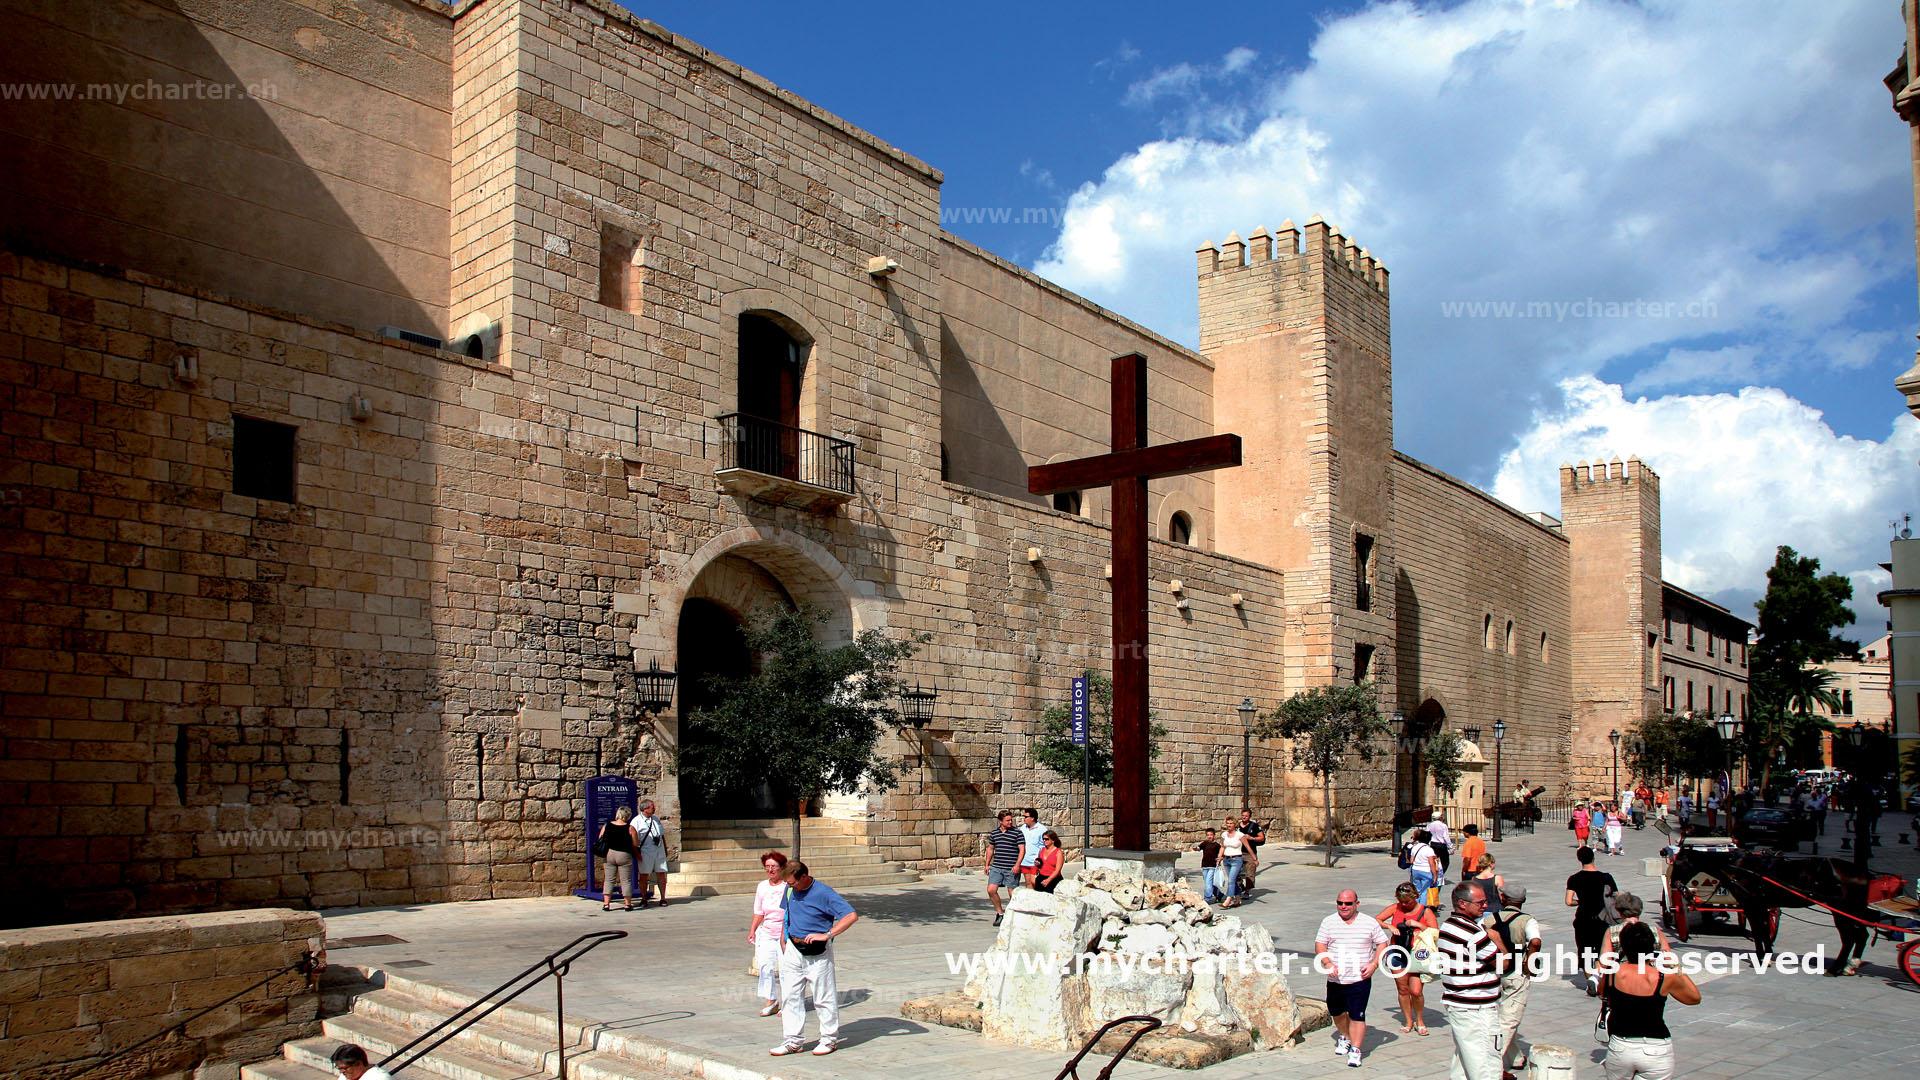 Mallorca - Palacio de la Almudaia Palma